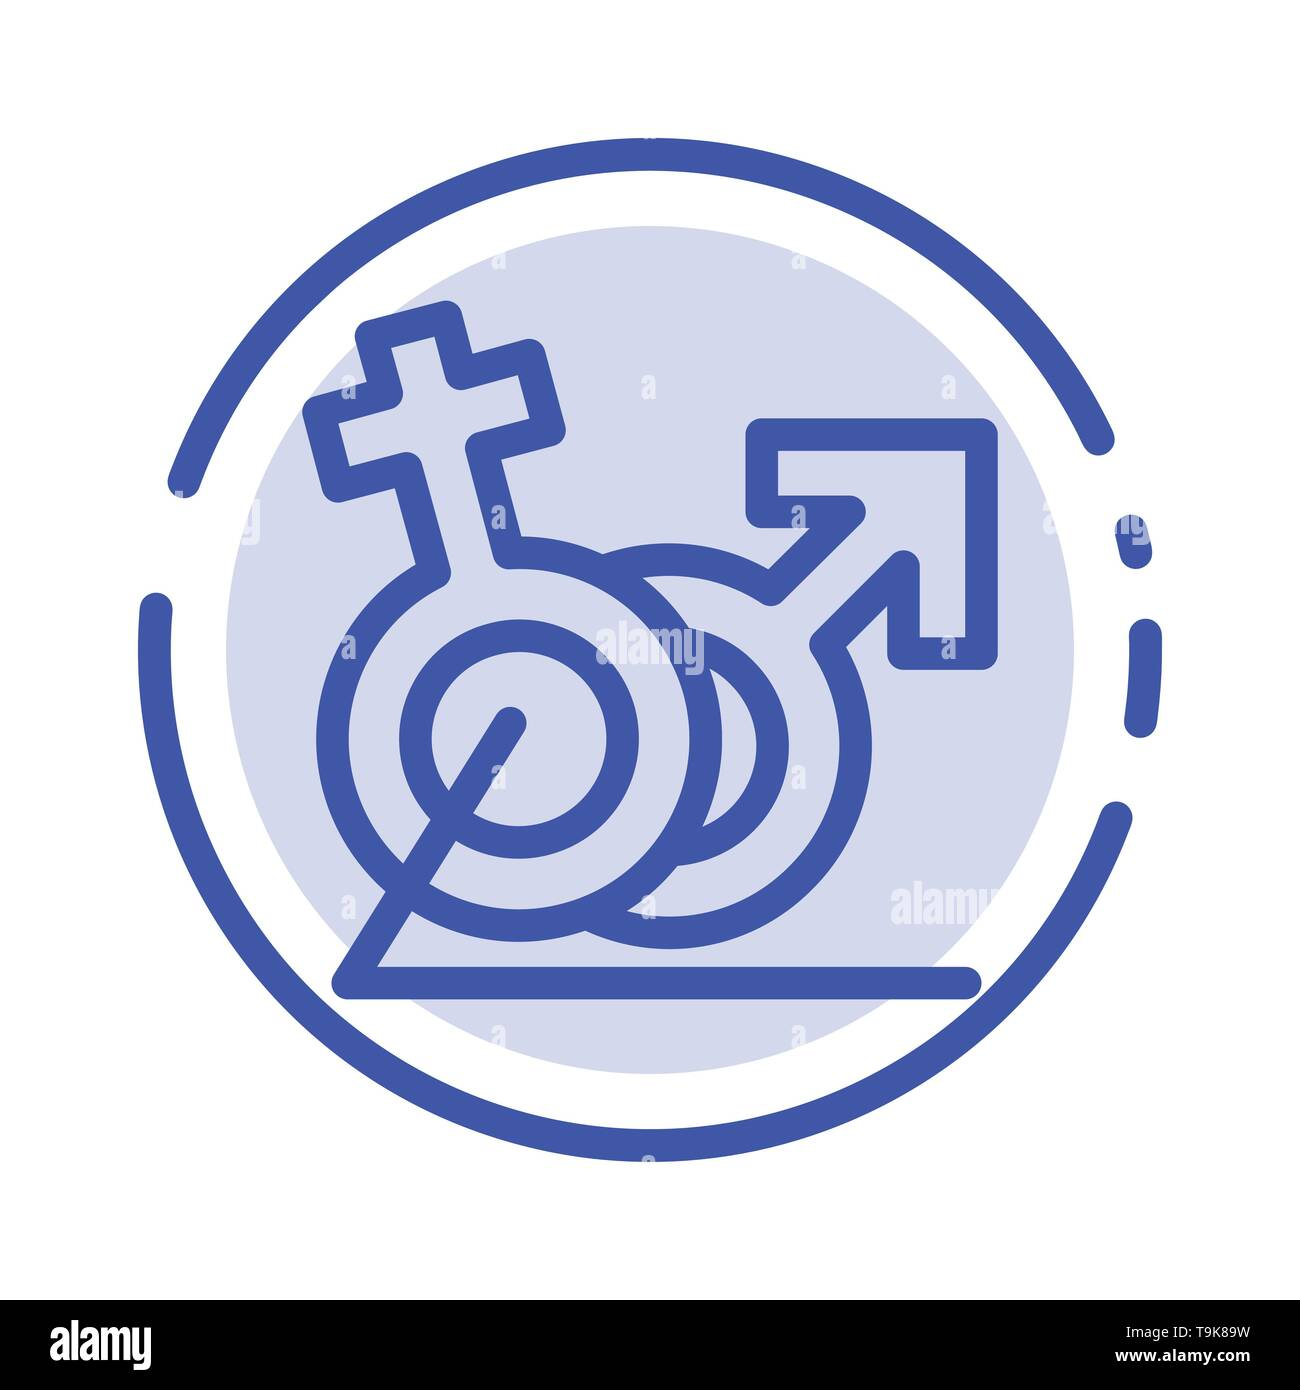 Men, Women, Sign, Gander, Identity Blue Dotted Line Line Icon - Stock Image